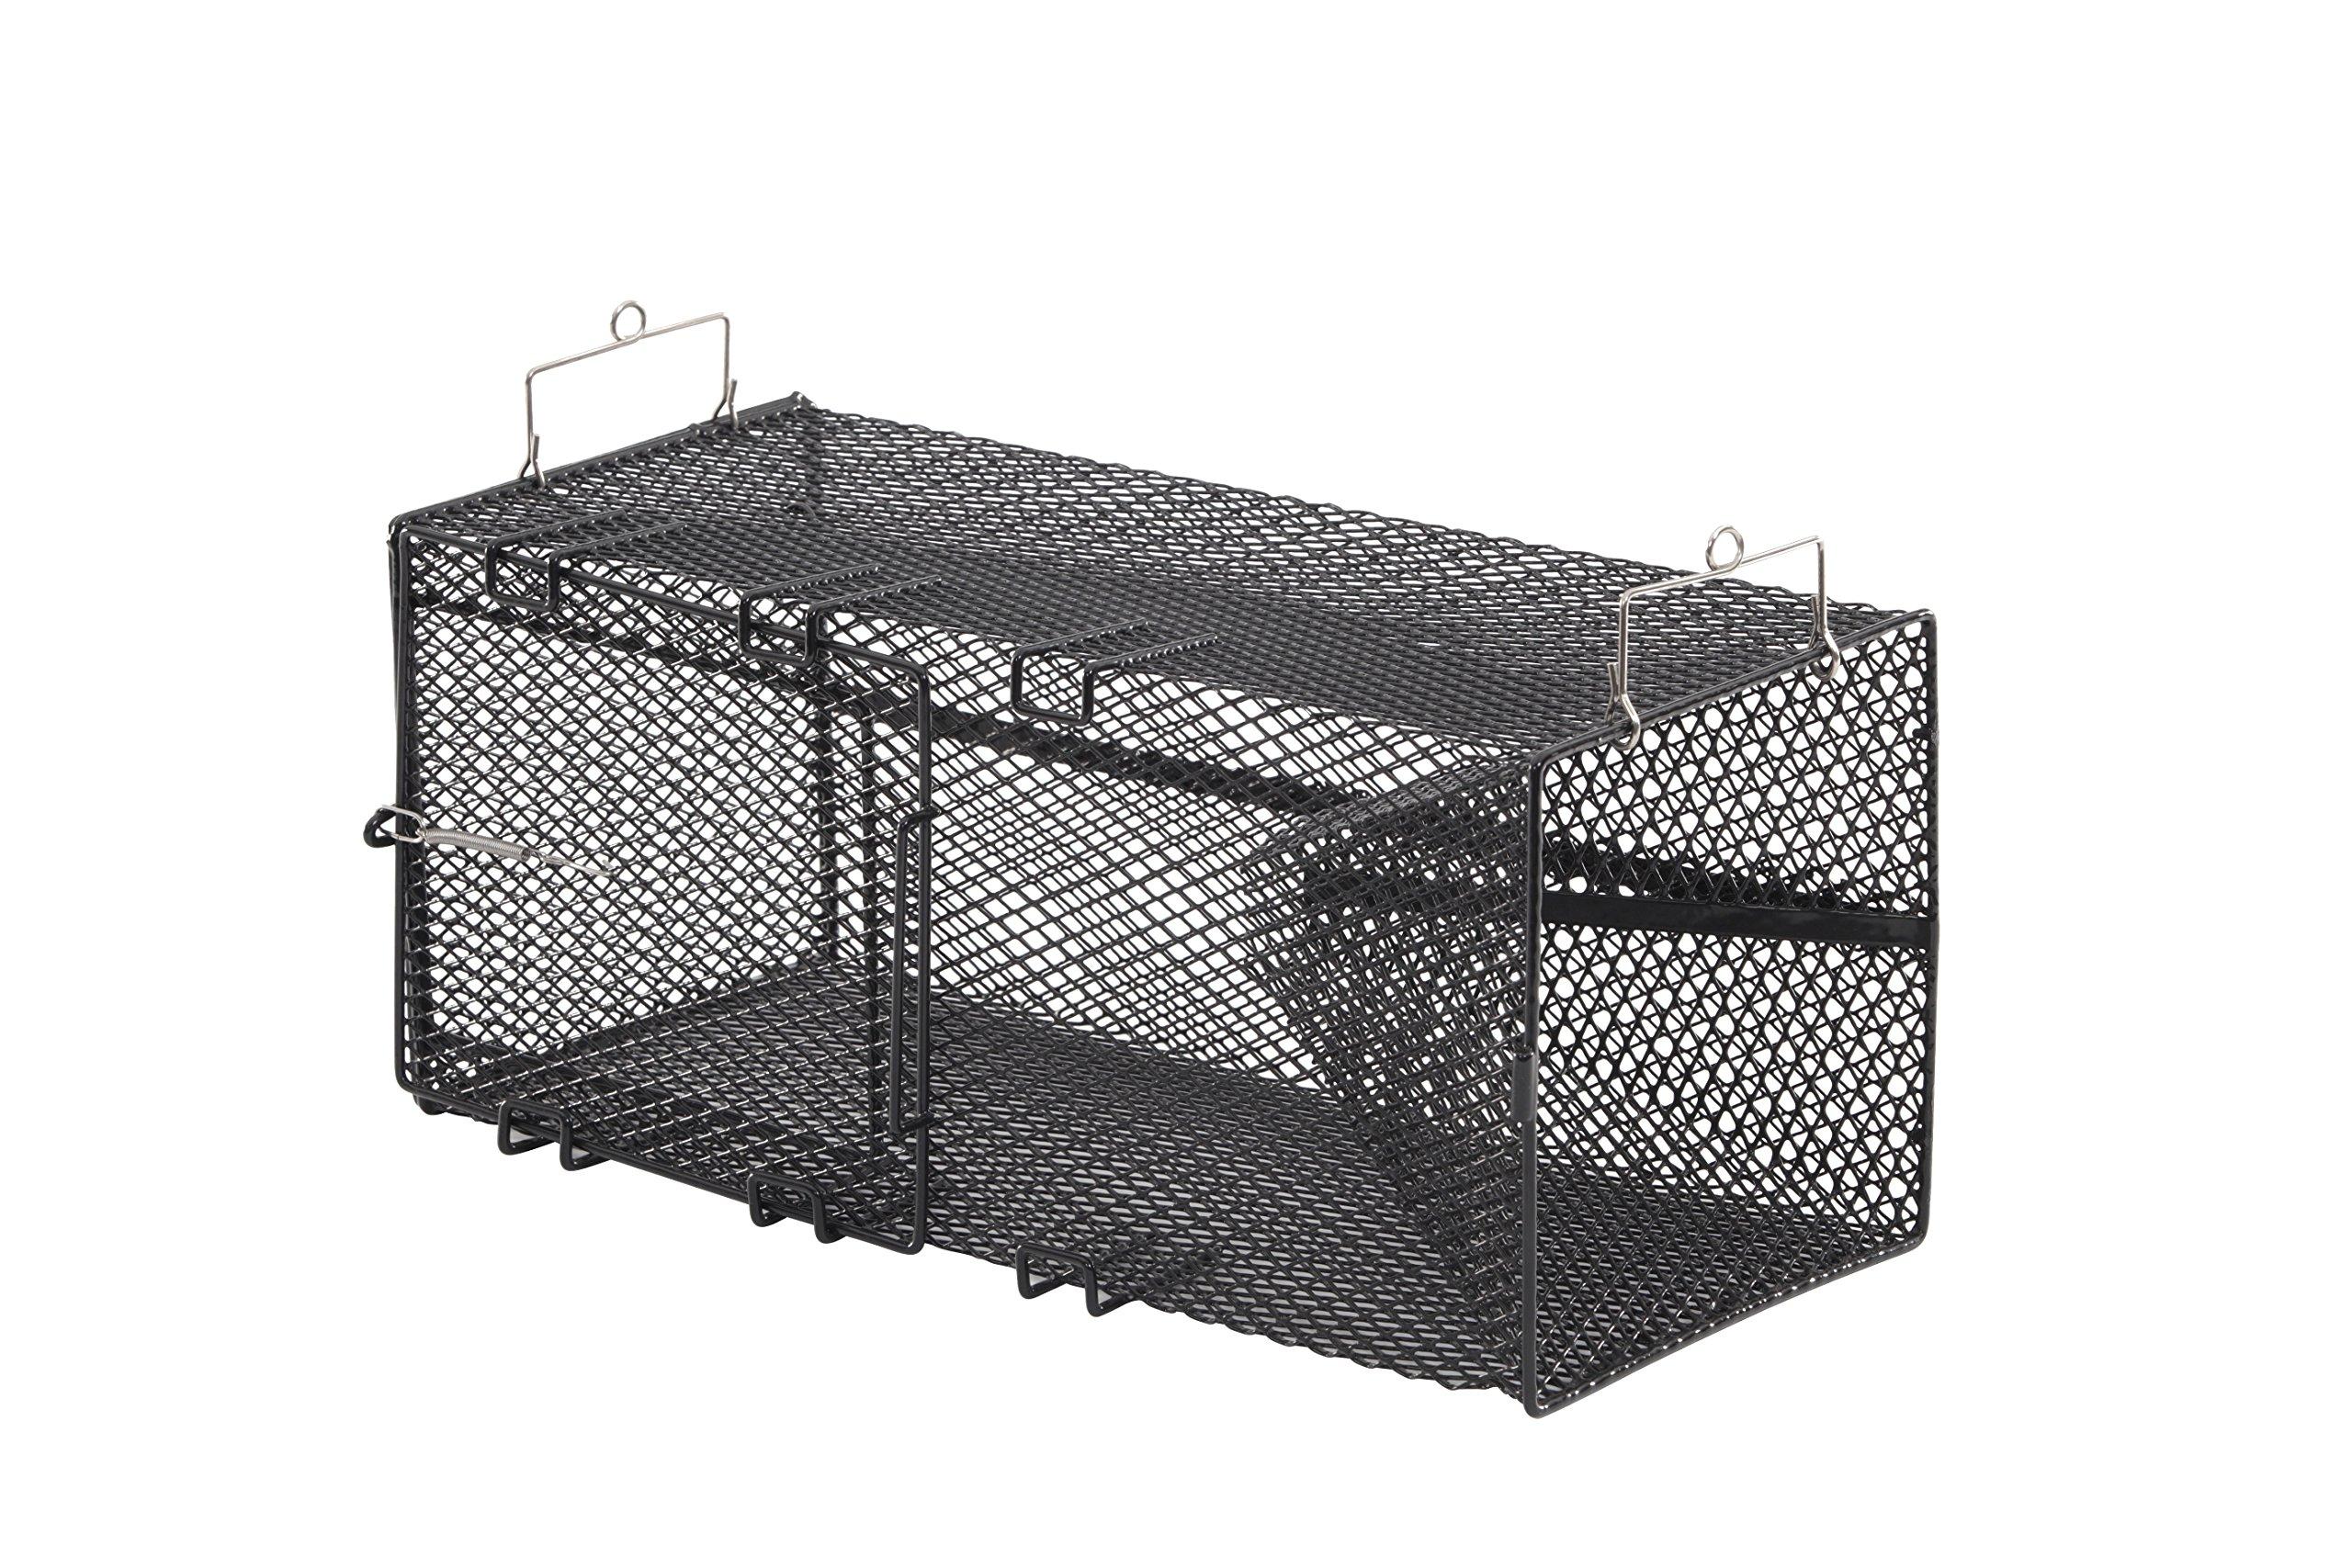 Frabill Minnow Trap, 8 x 8 x 18-Inch, Black